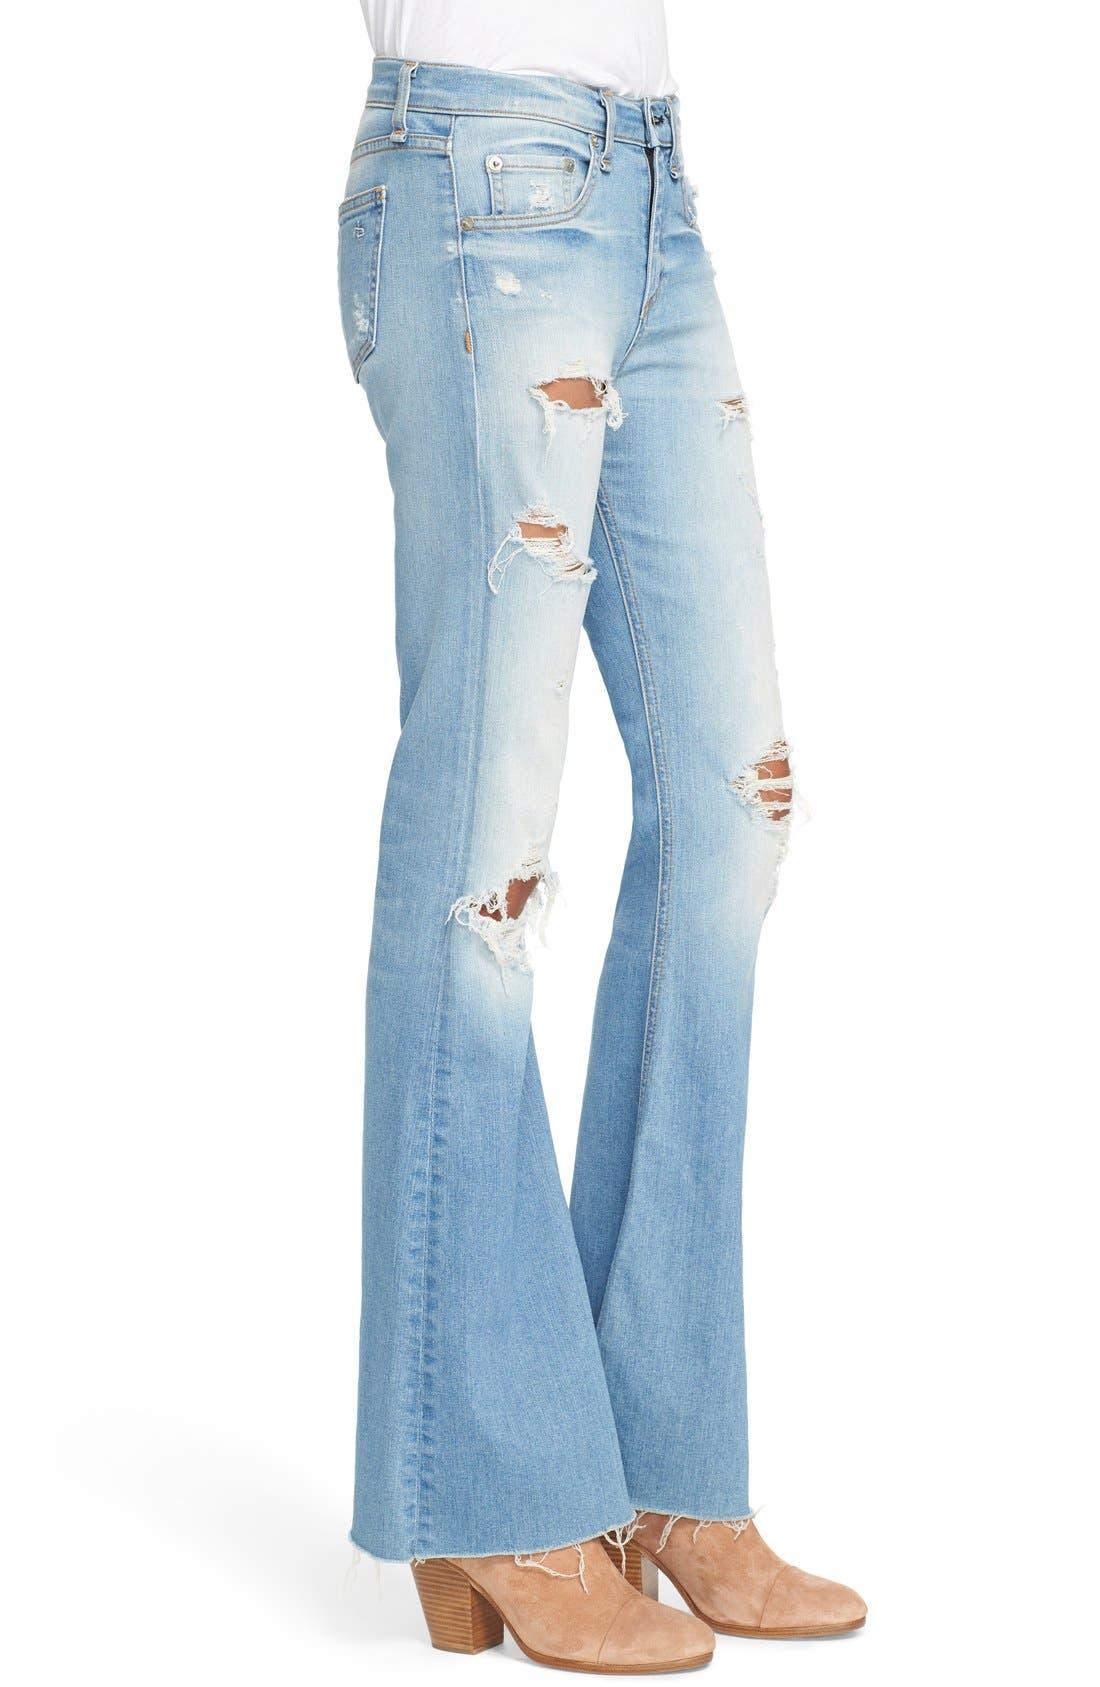 Alternate Image 3  - rag & bone/JEAN 'Beach' High Rise Bell Bottom Jeans (Ryder)